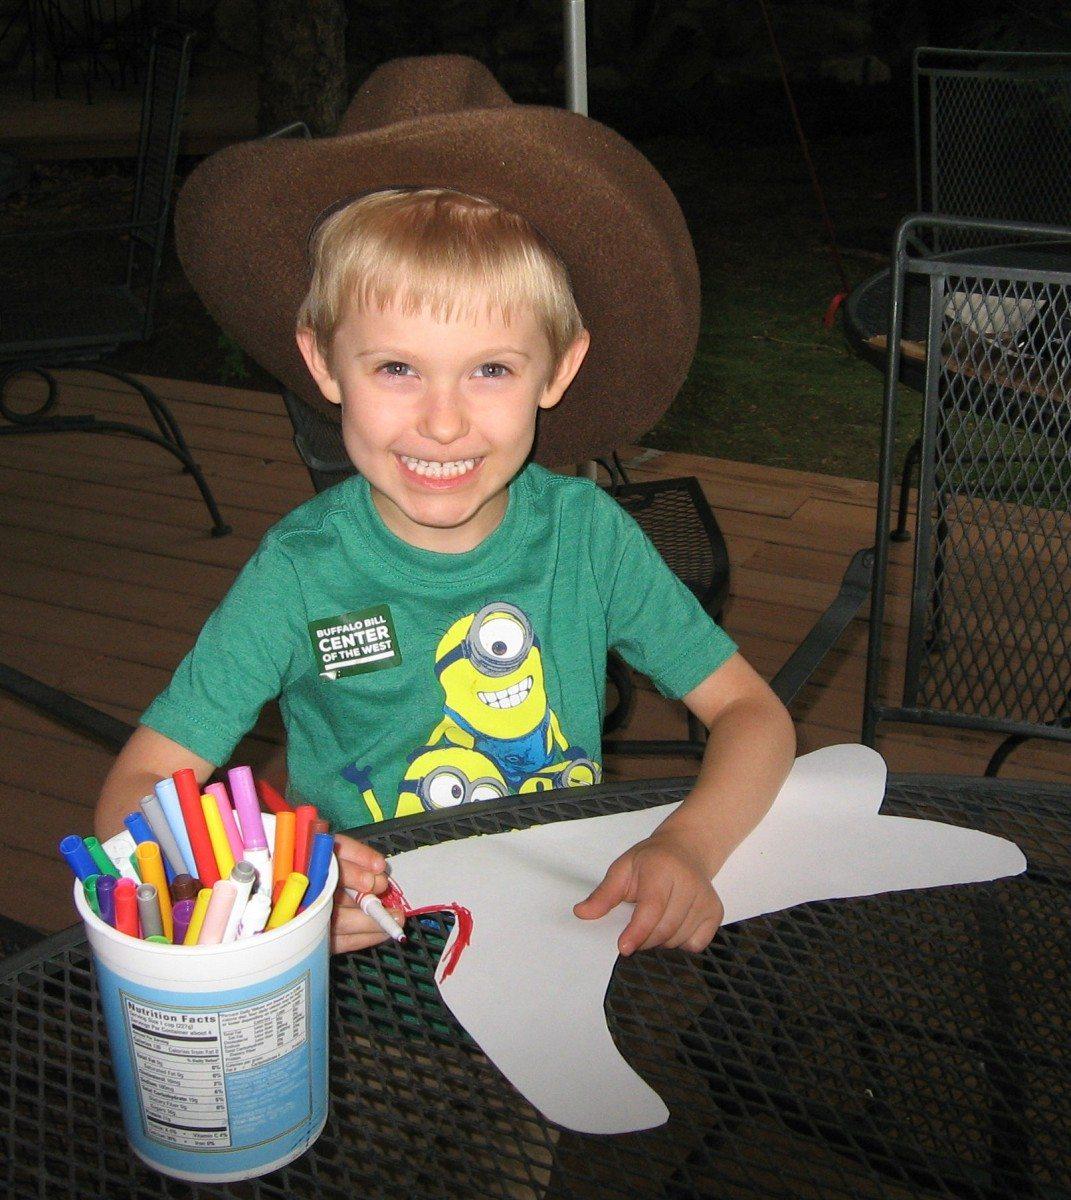 Here's a child enjoying the wonderful activity provided